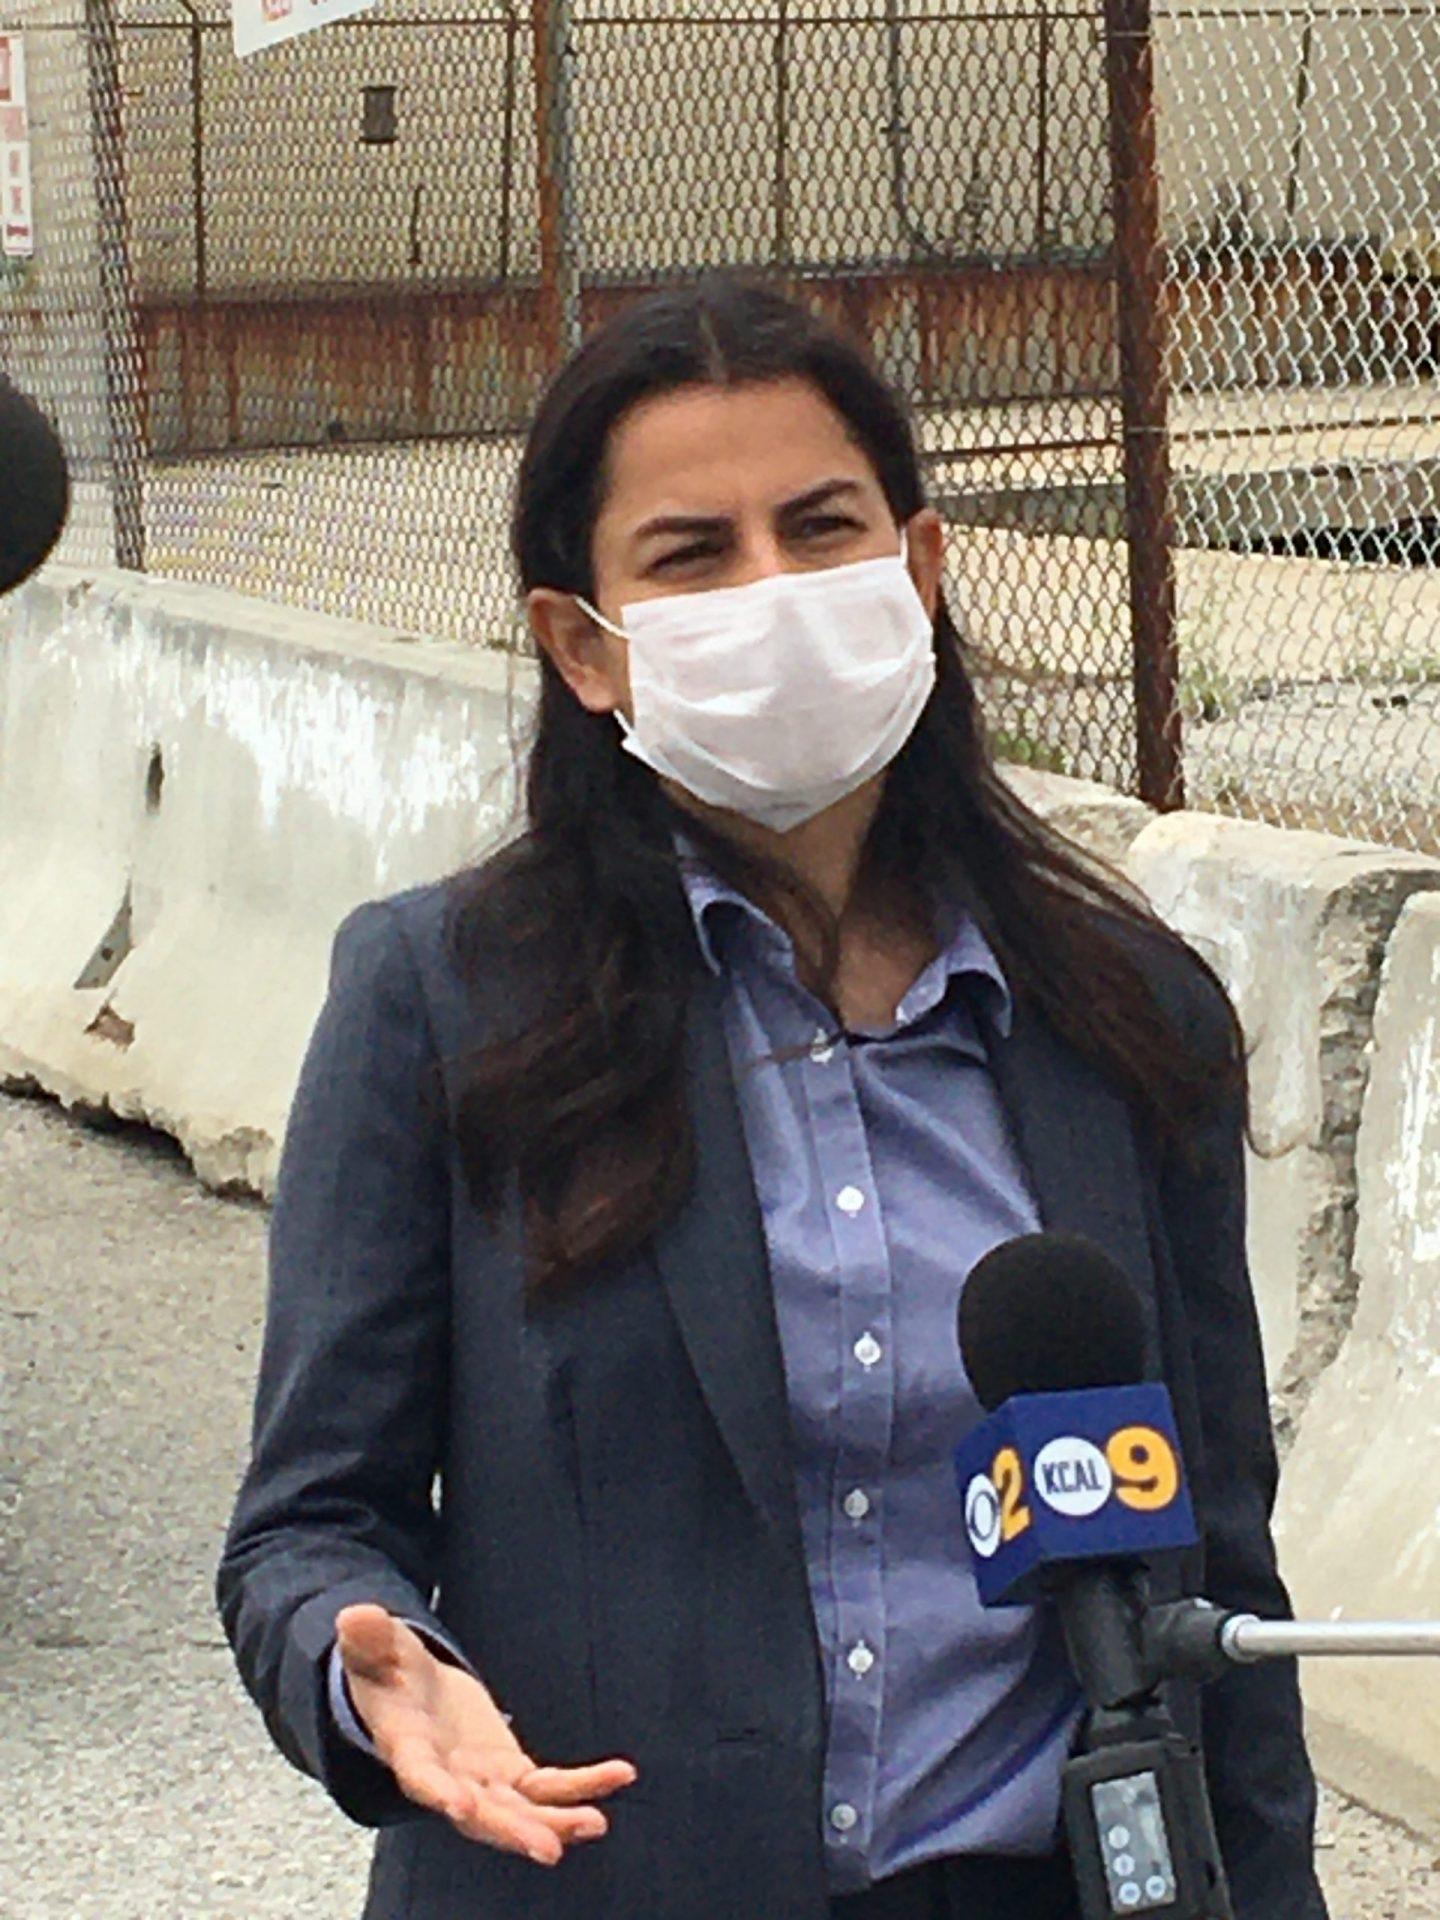 Congresswoman Barragan speaks to reporters wearing a mask